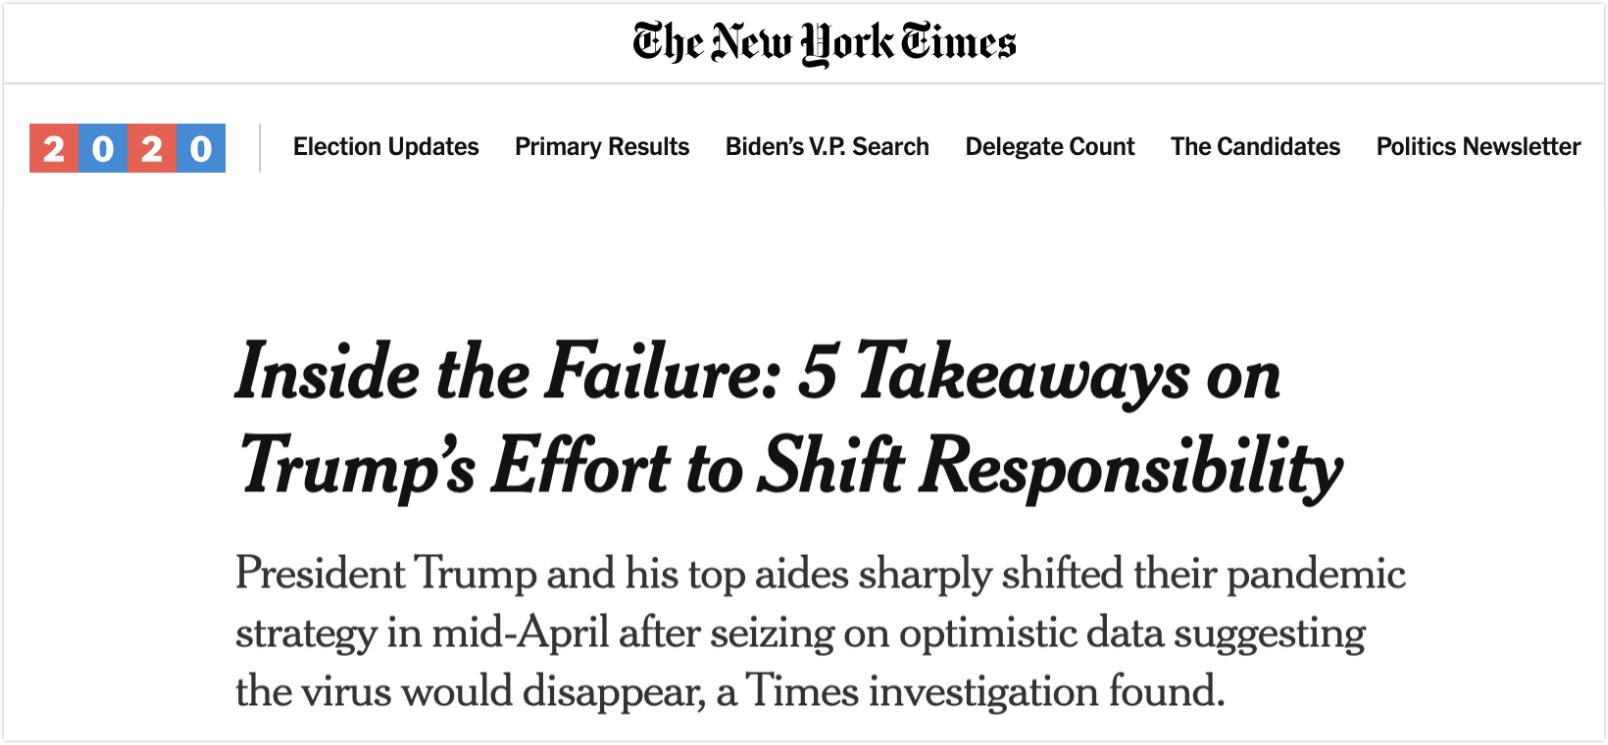 △《纽约时报》报道